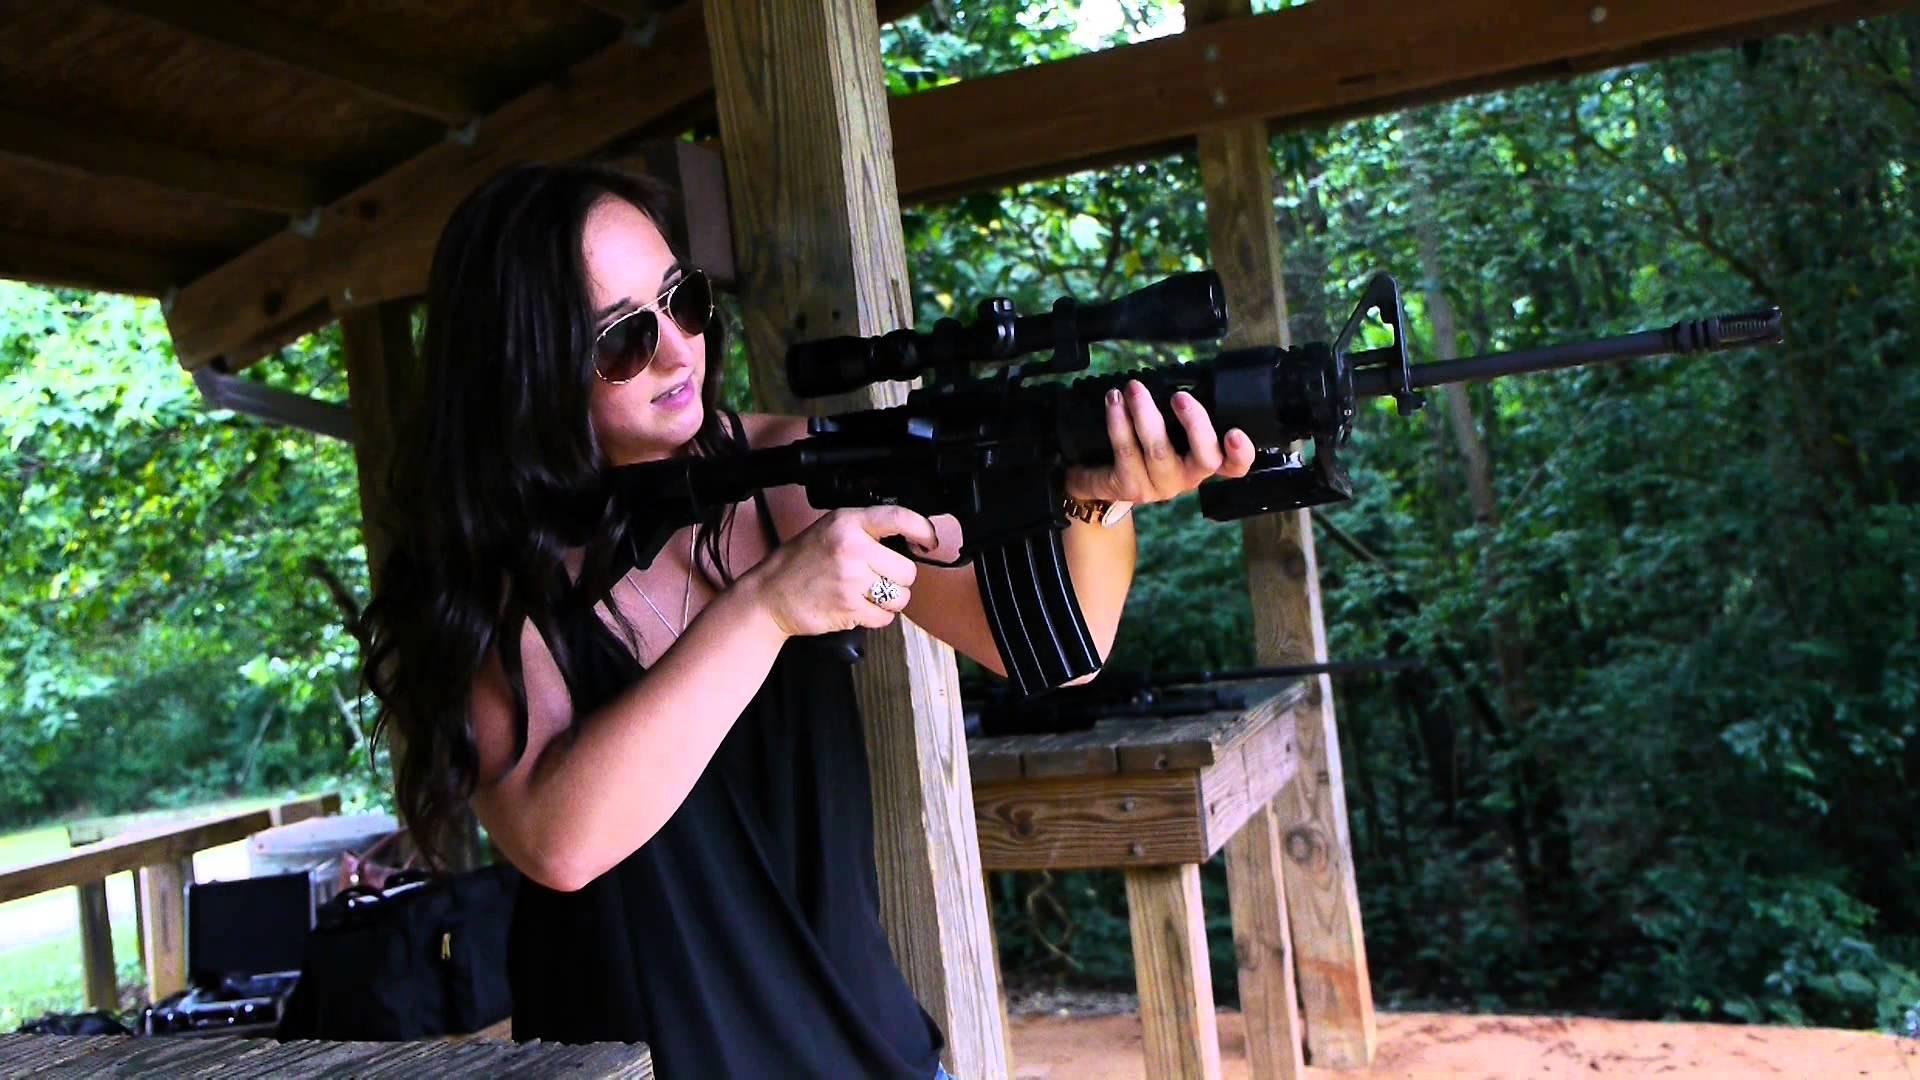 Paige Shooting a Del-Ton AR-15 Rifle